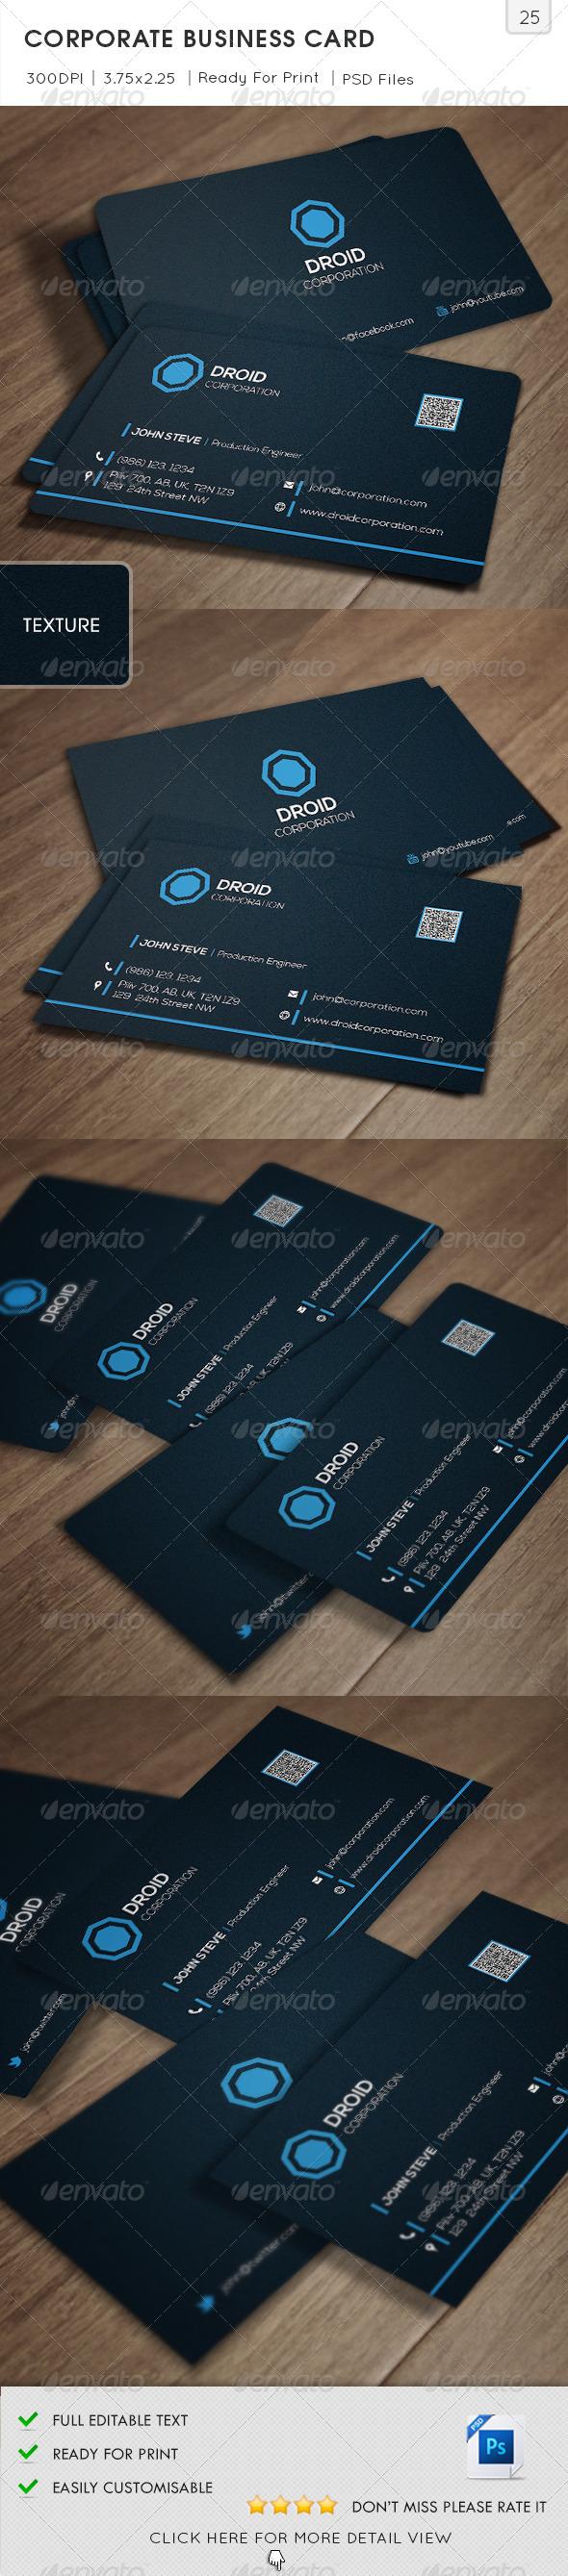 Corporate Business Card v25 - Corporate Business Cards